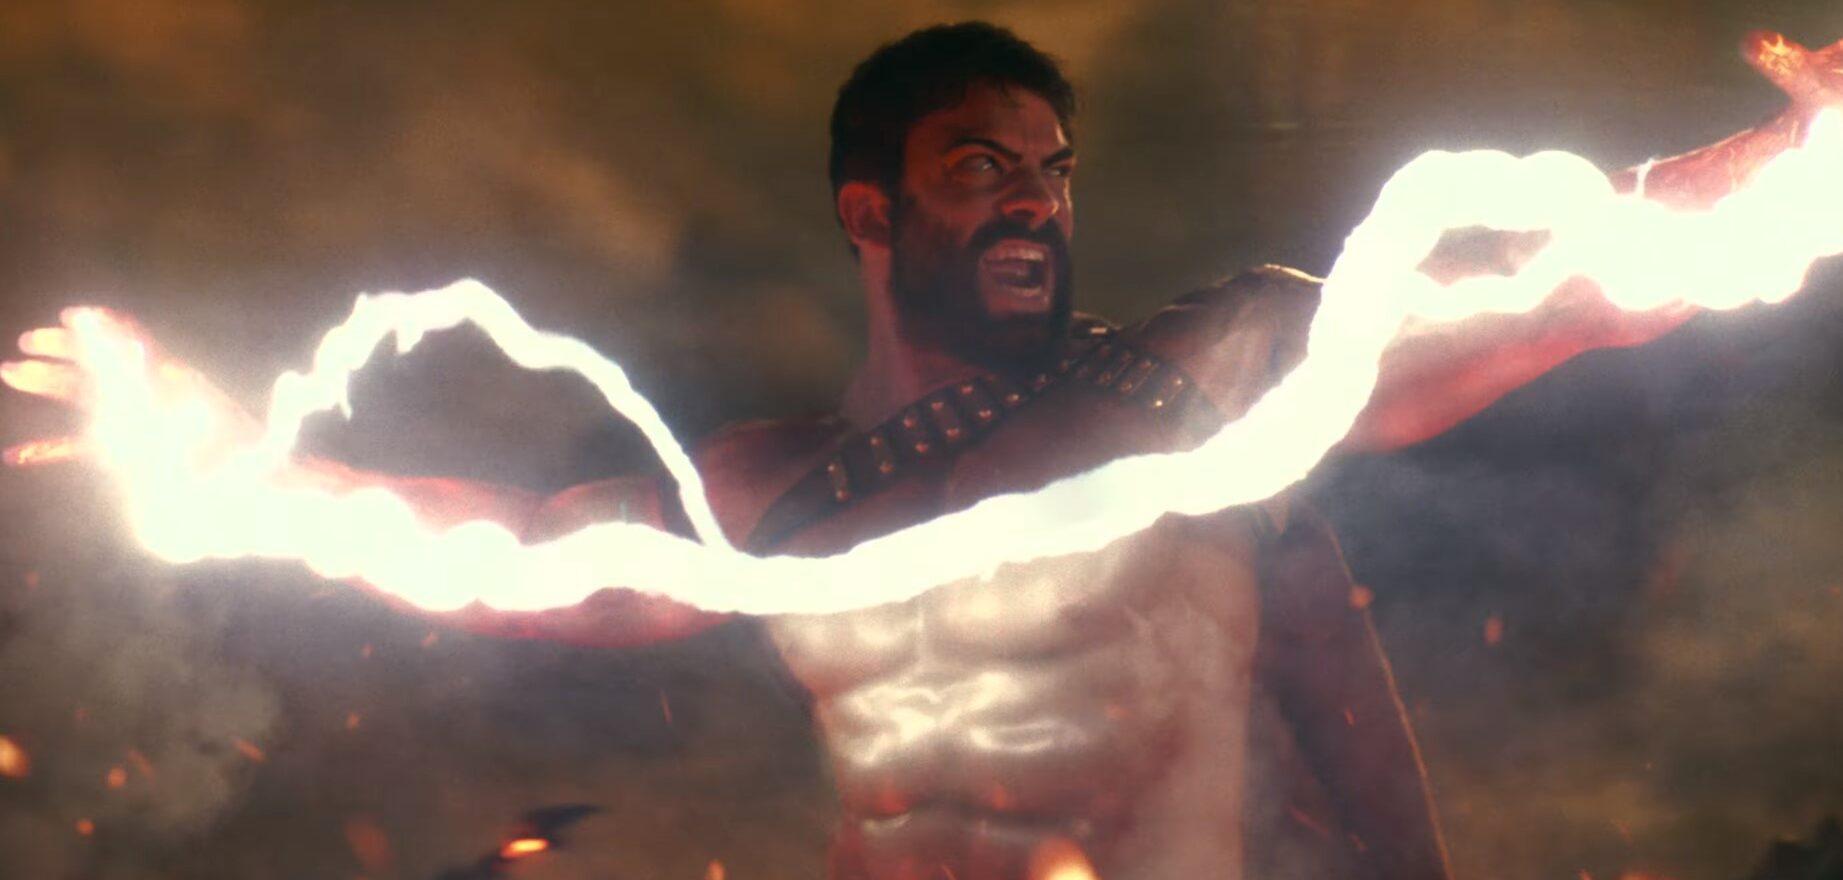 Liga da Justiça de Zack Snyder Cut; Darkseid; Zeus